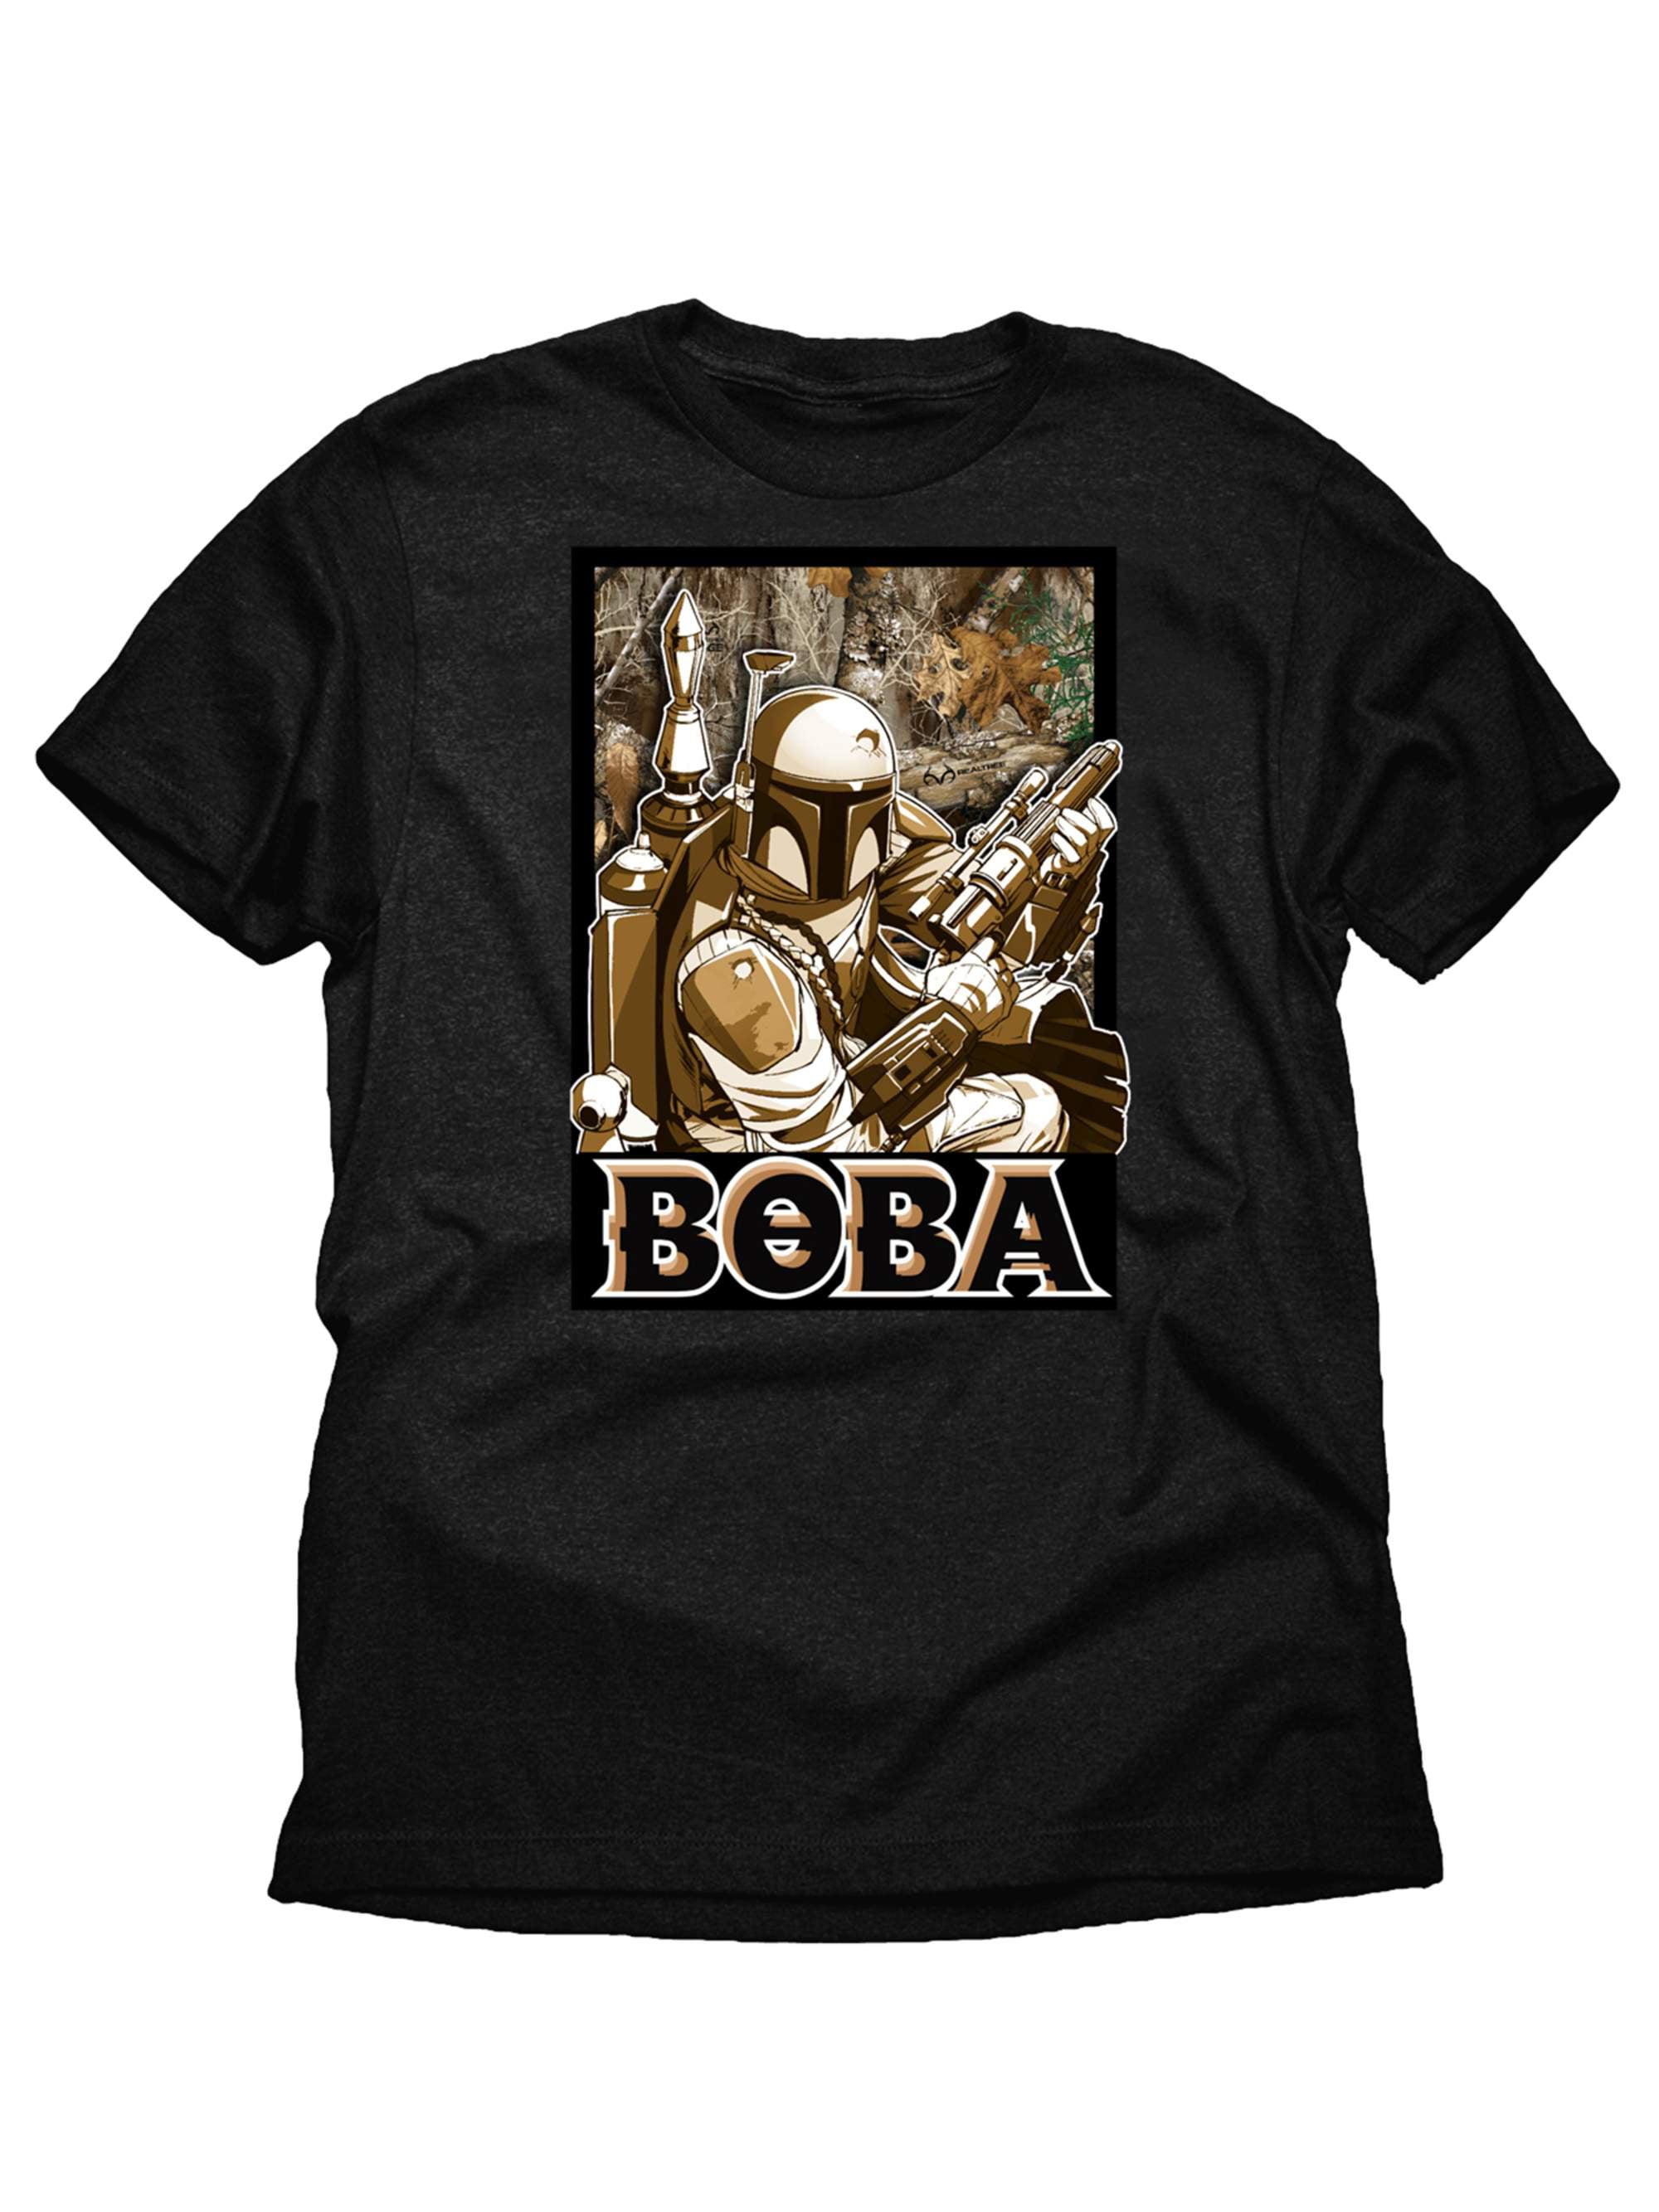 Star Wars Boba Fett Realtree Boys Black Graphic T-Shirt